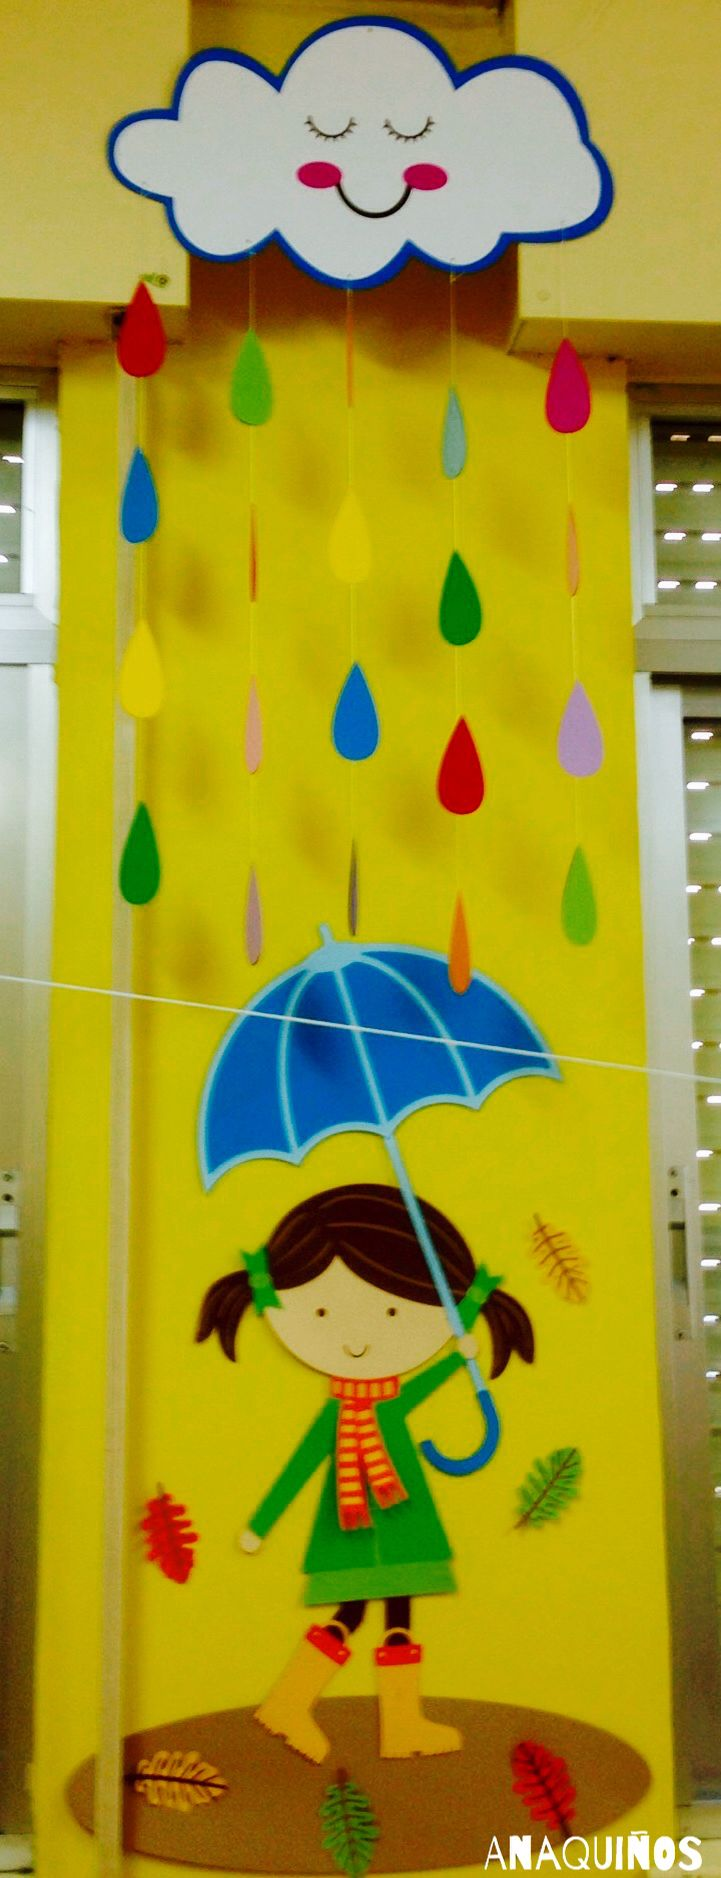 Llueve oto o jard n acurela for Decoracion puerta aula infantil